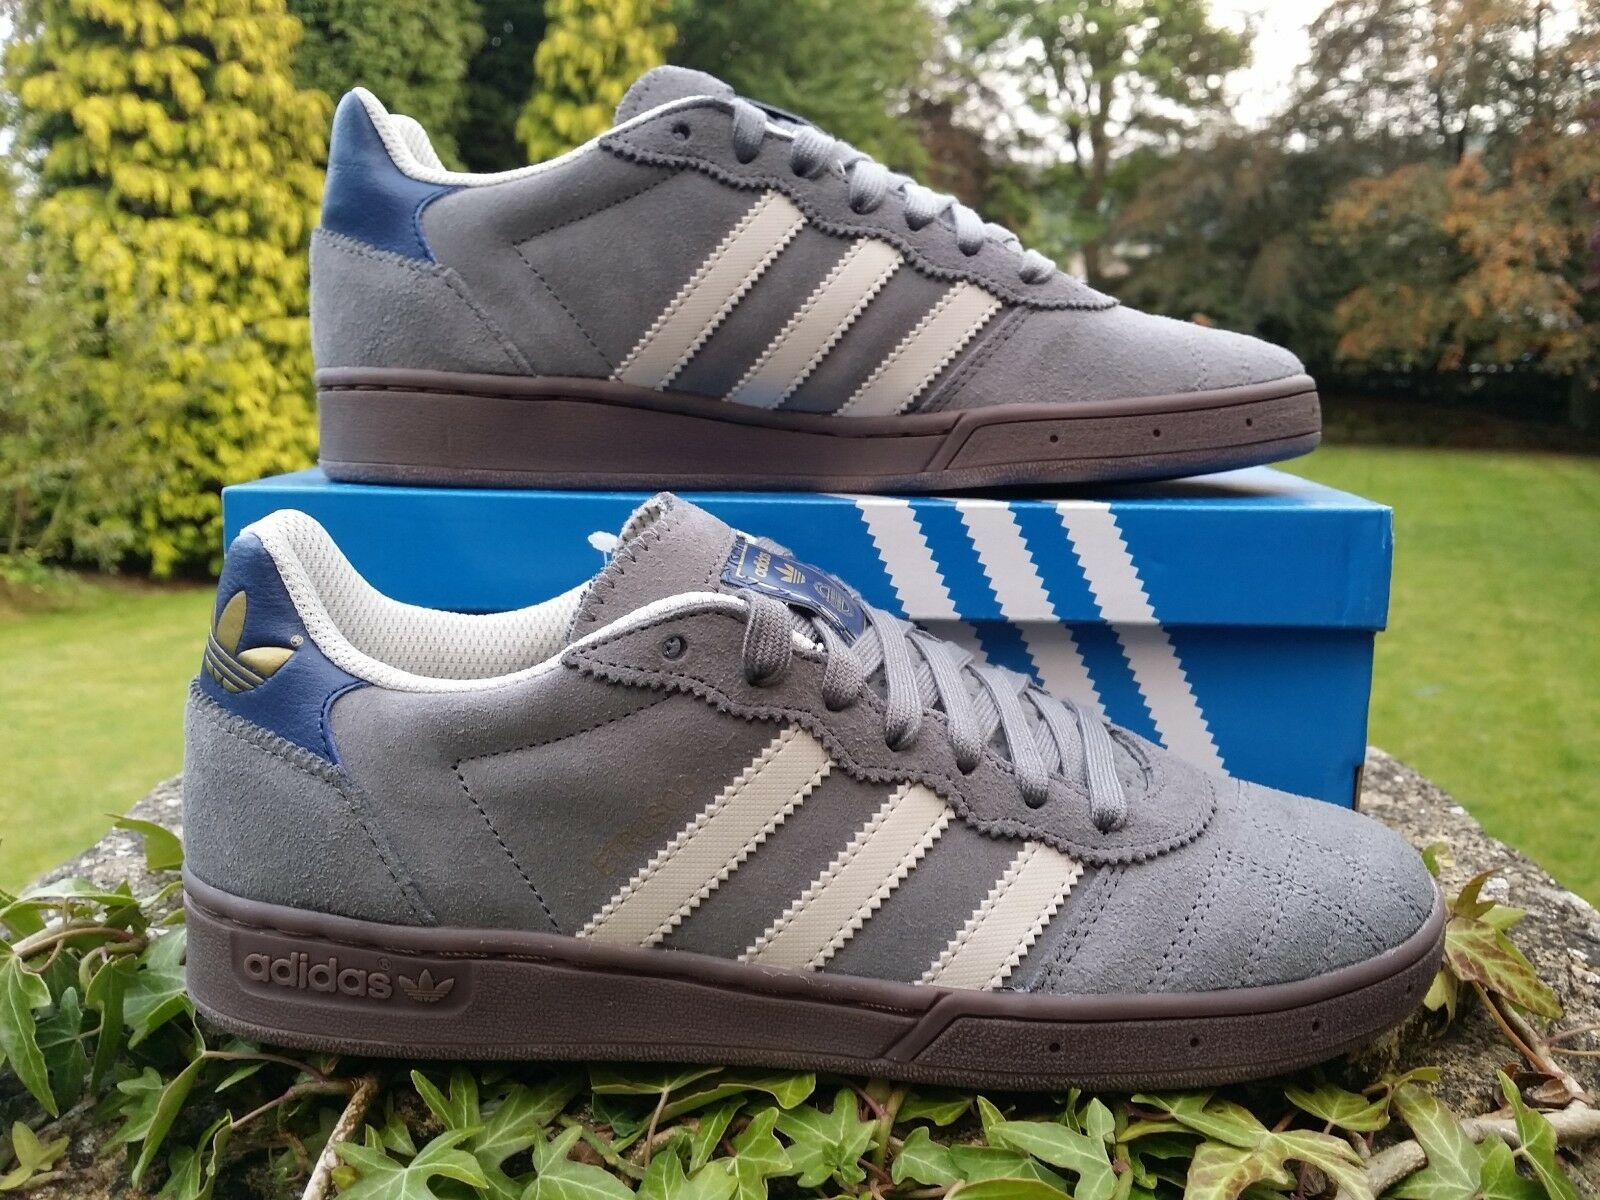 Uomo Boys Adidas Originals Sneakers Etrusco Suede  Fashion Sneakers Originals Trainers NEW UK 6 9b500f